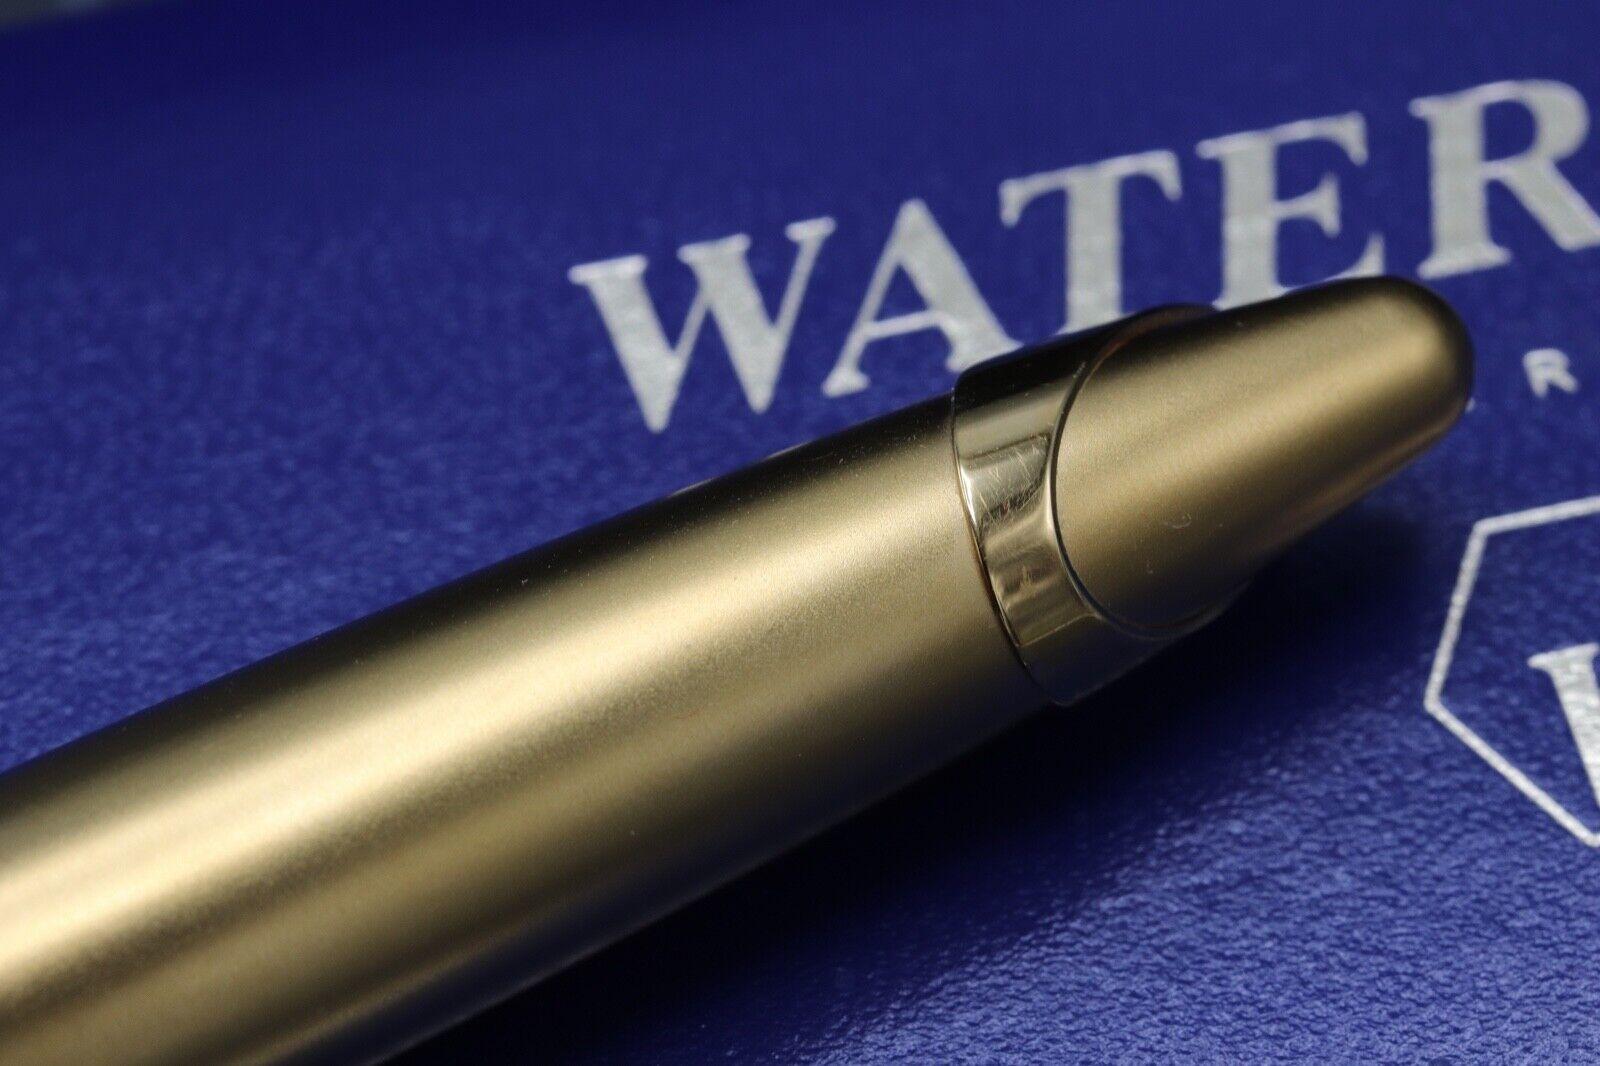 Waterman Edson Sapphire Blue Ballpoint Pen 4